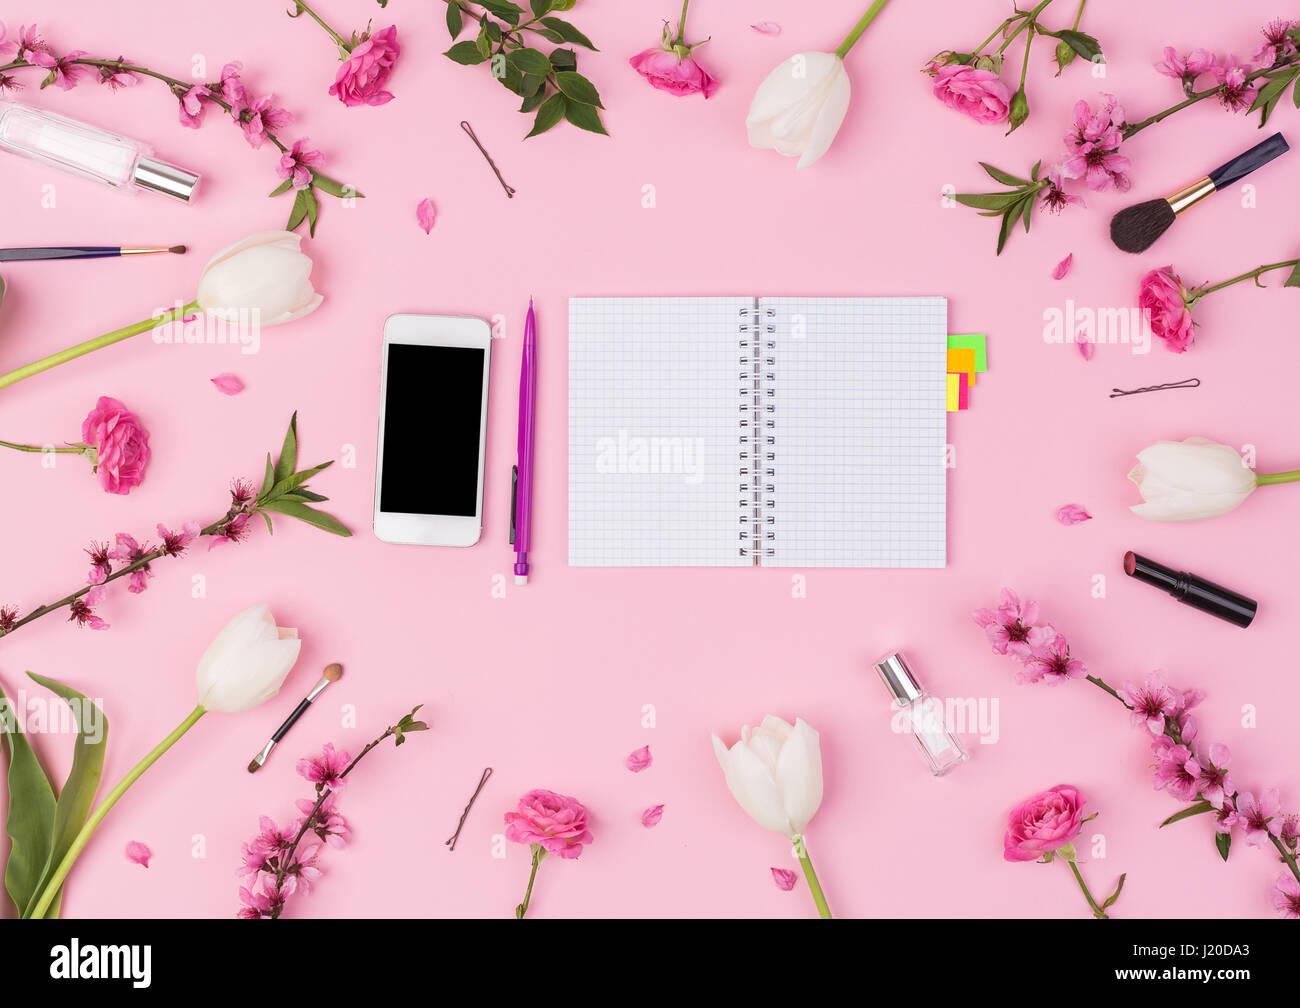 Girly Beauty Blog Molla Concetto Bloggerworkspace Femminile Con